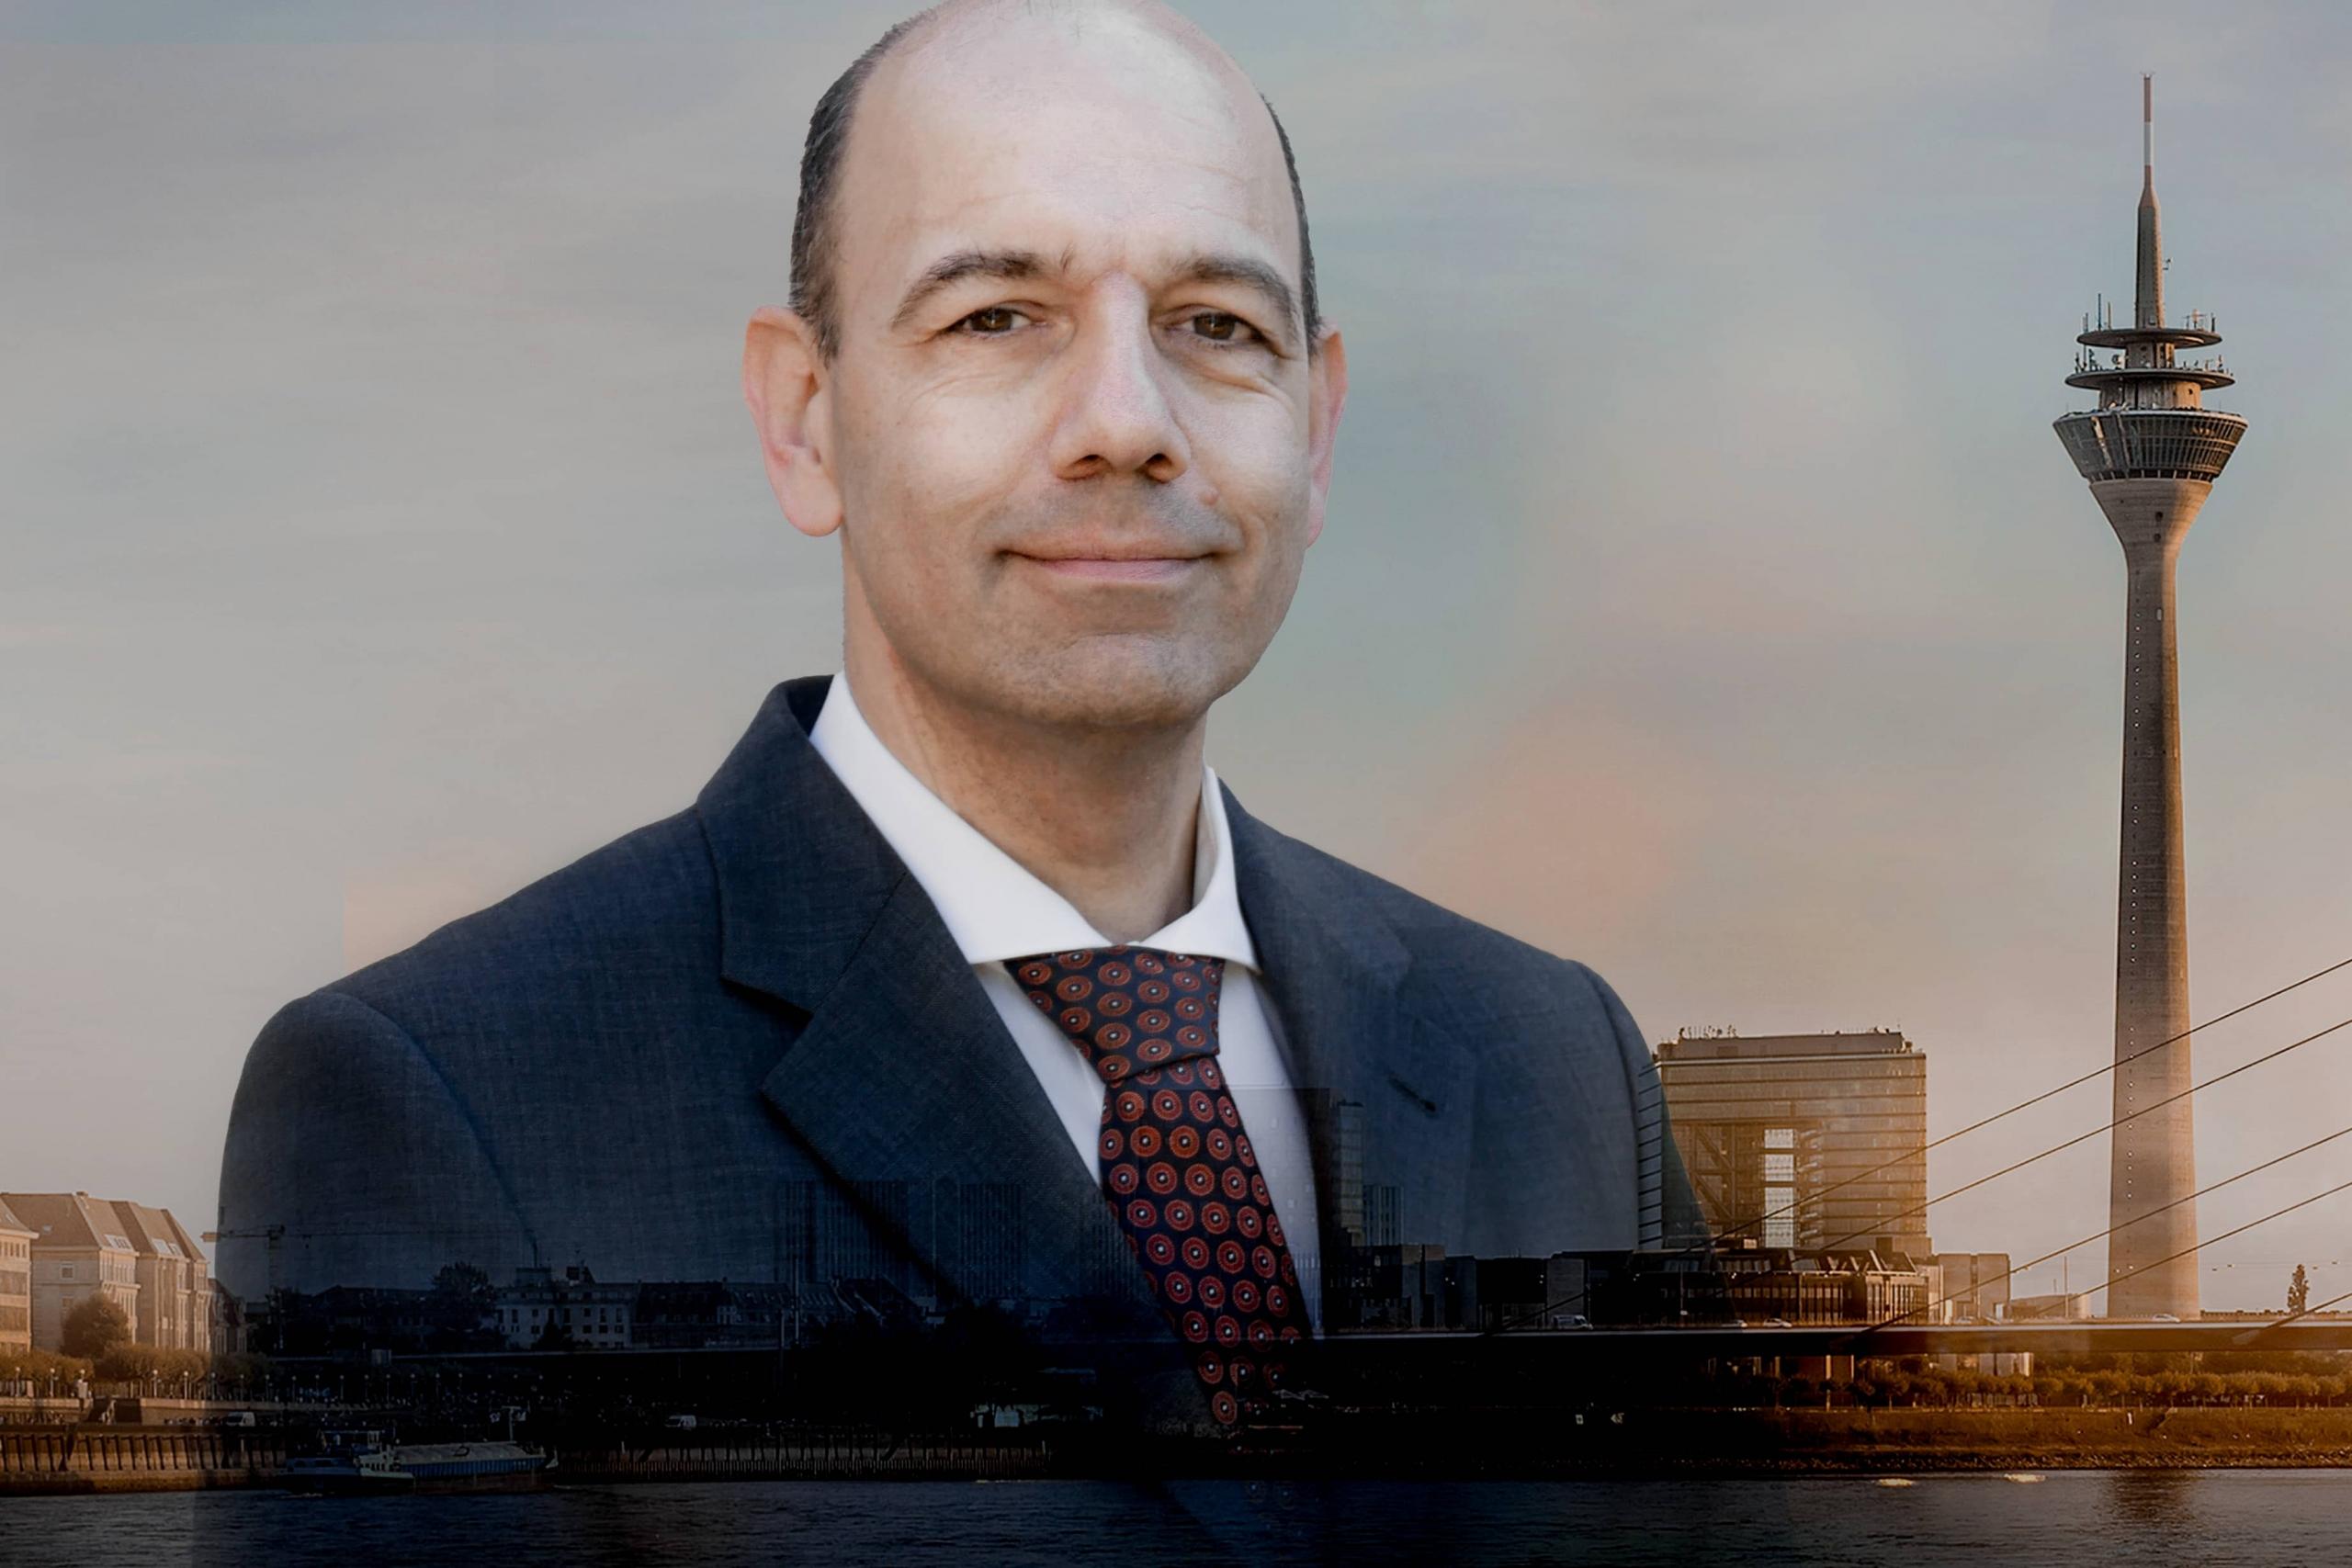 Markus Schmidt – Partner ACTIVE M&A Experts, Düsseldorf